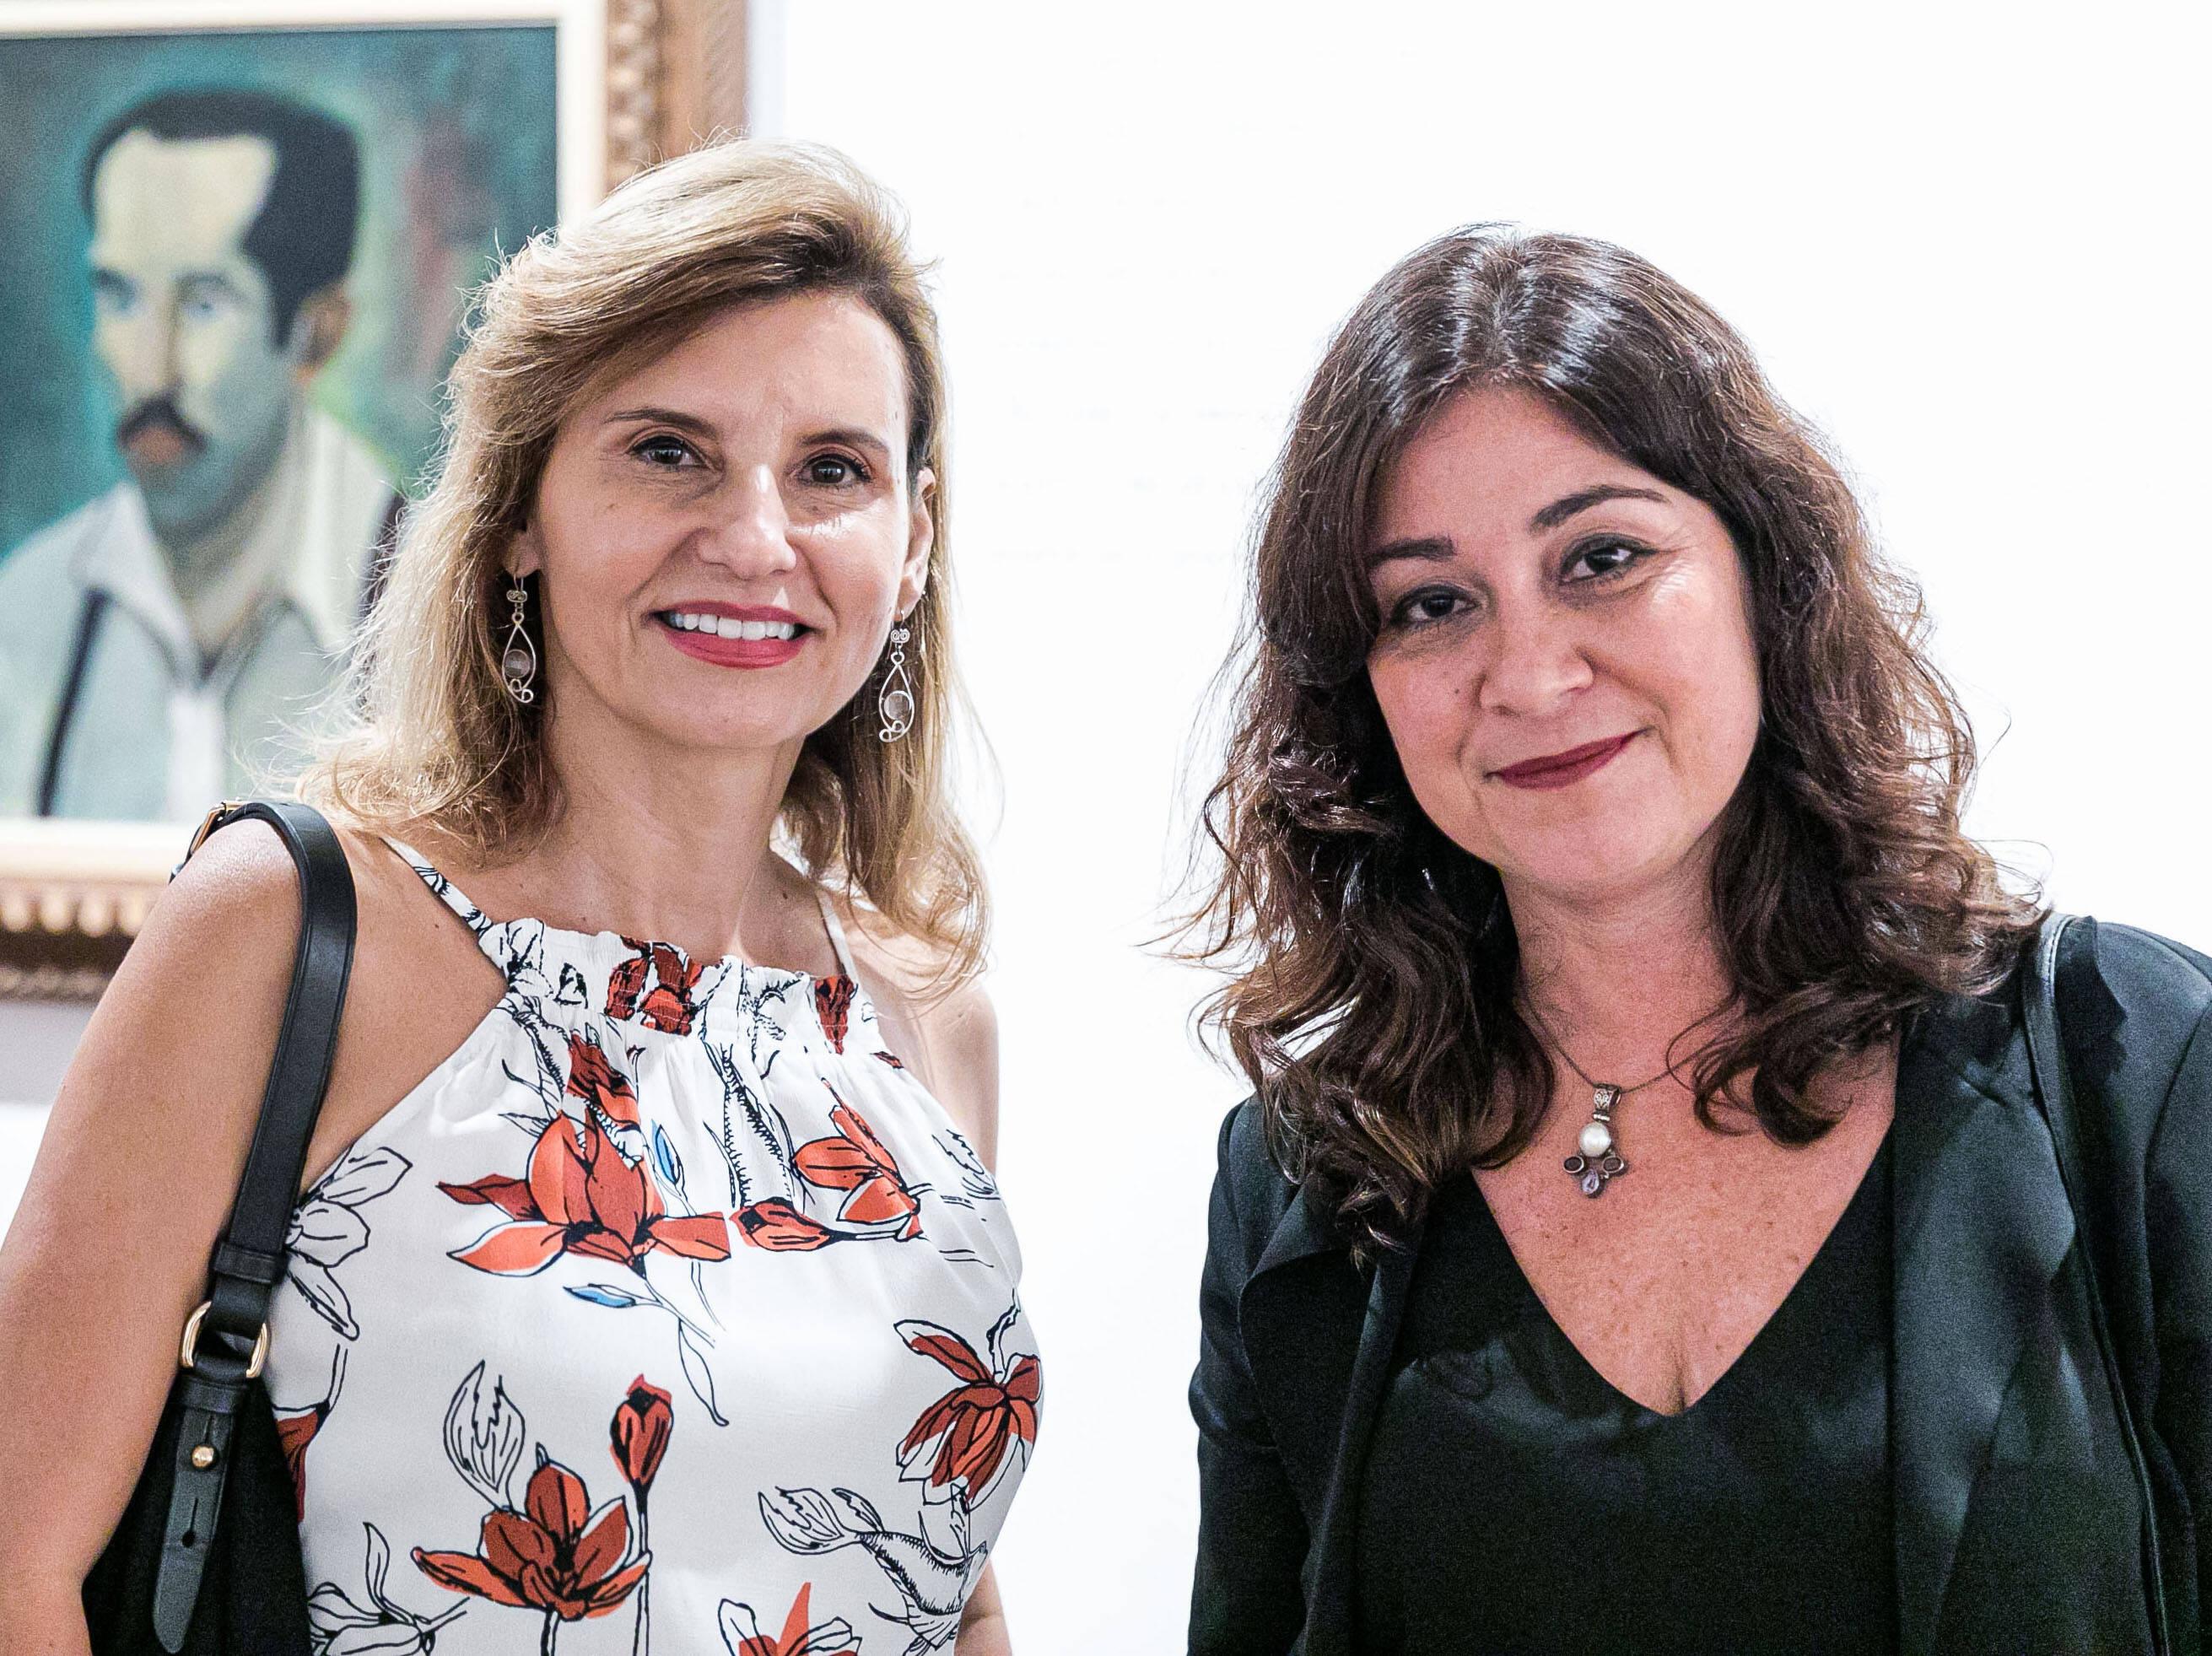 Margarida Mello e Ula Pancetti / Foto: Miguel Sá